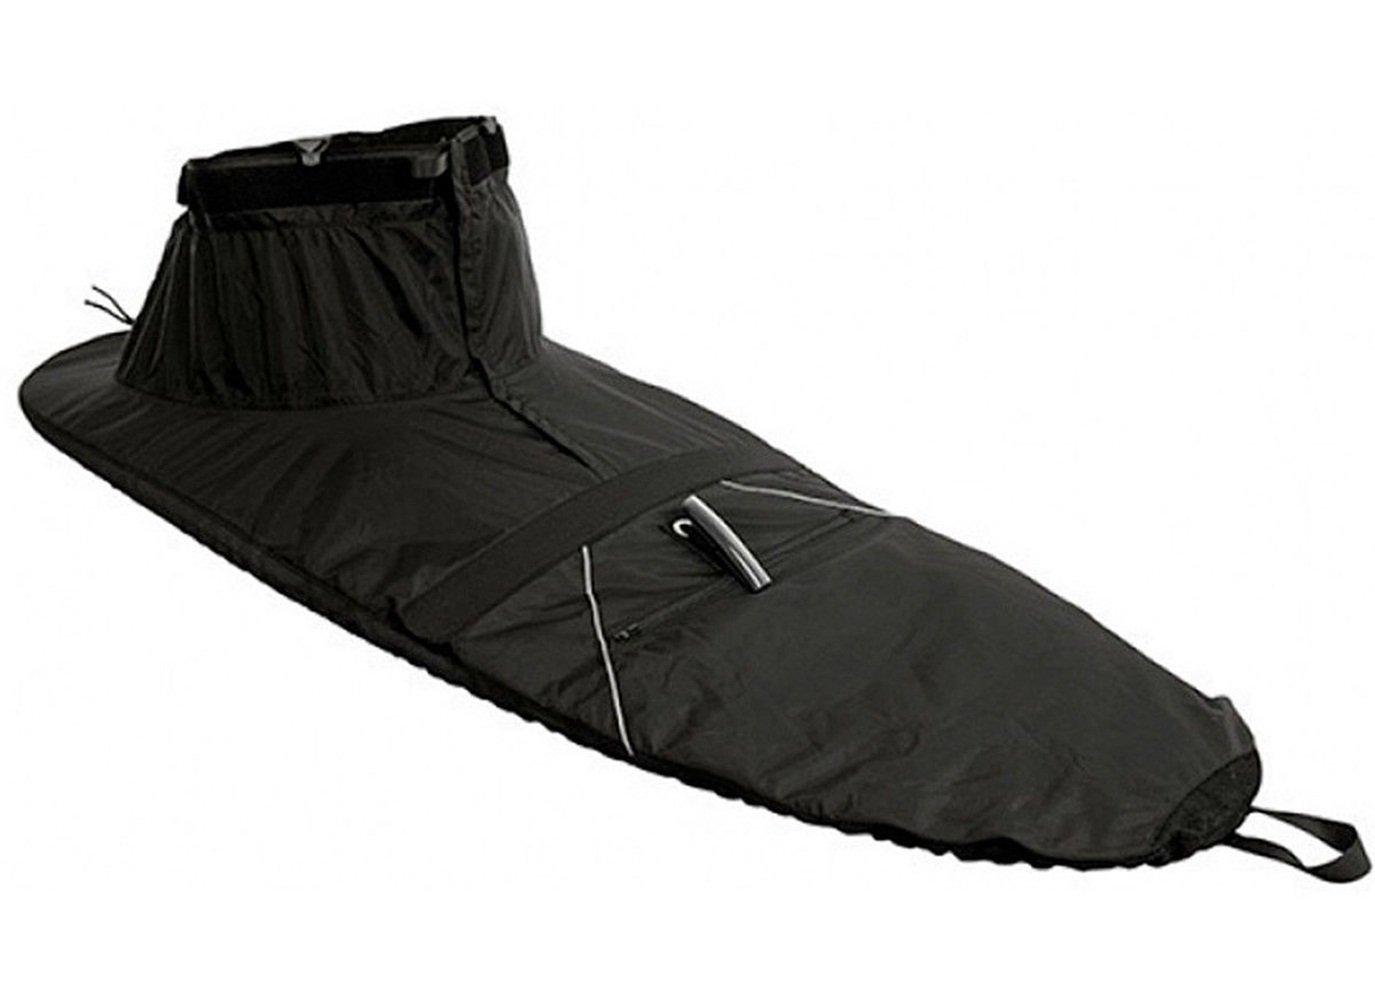 Harmony Synergy Kayak Spray Skirt with Neoprene Waist 60/23 Accessories Skirt